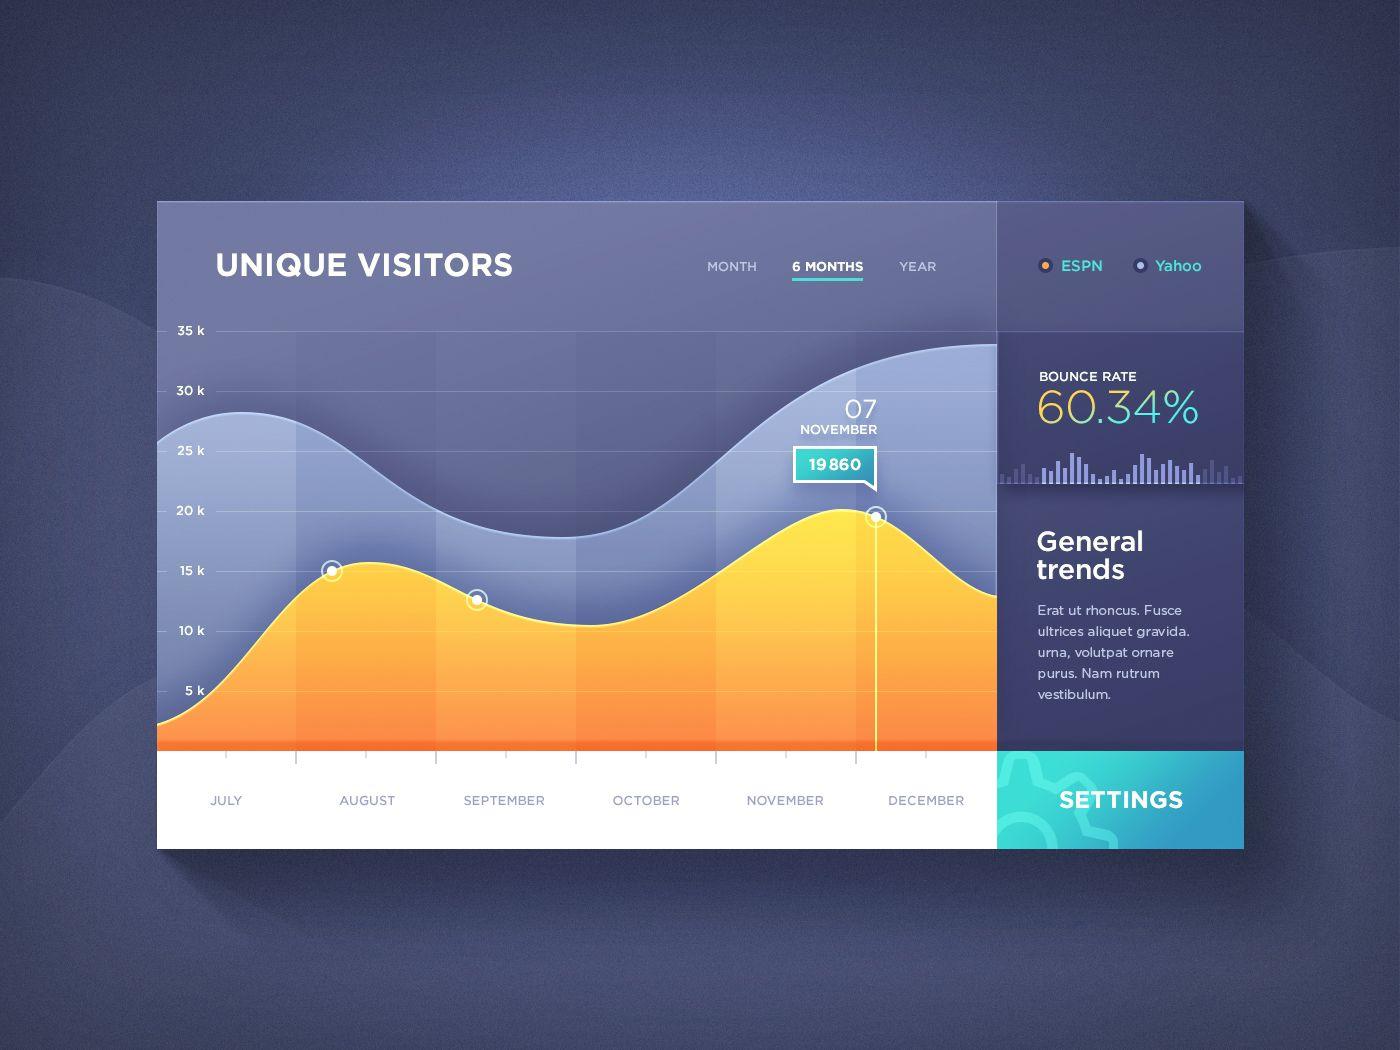 Dribbble social app ui design jpg by ramotion - Statistics General Trends Ui Ux Designdashboard